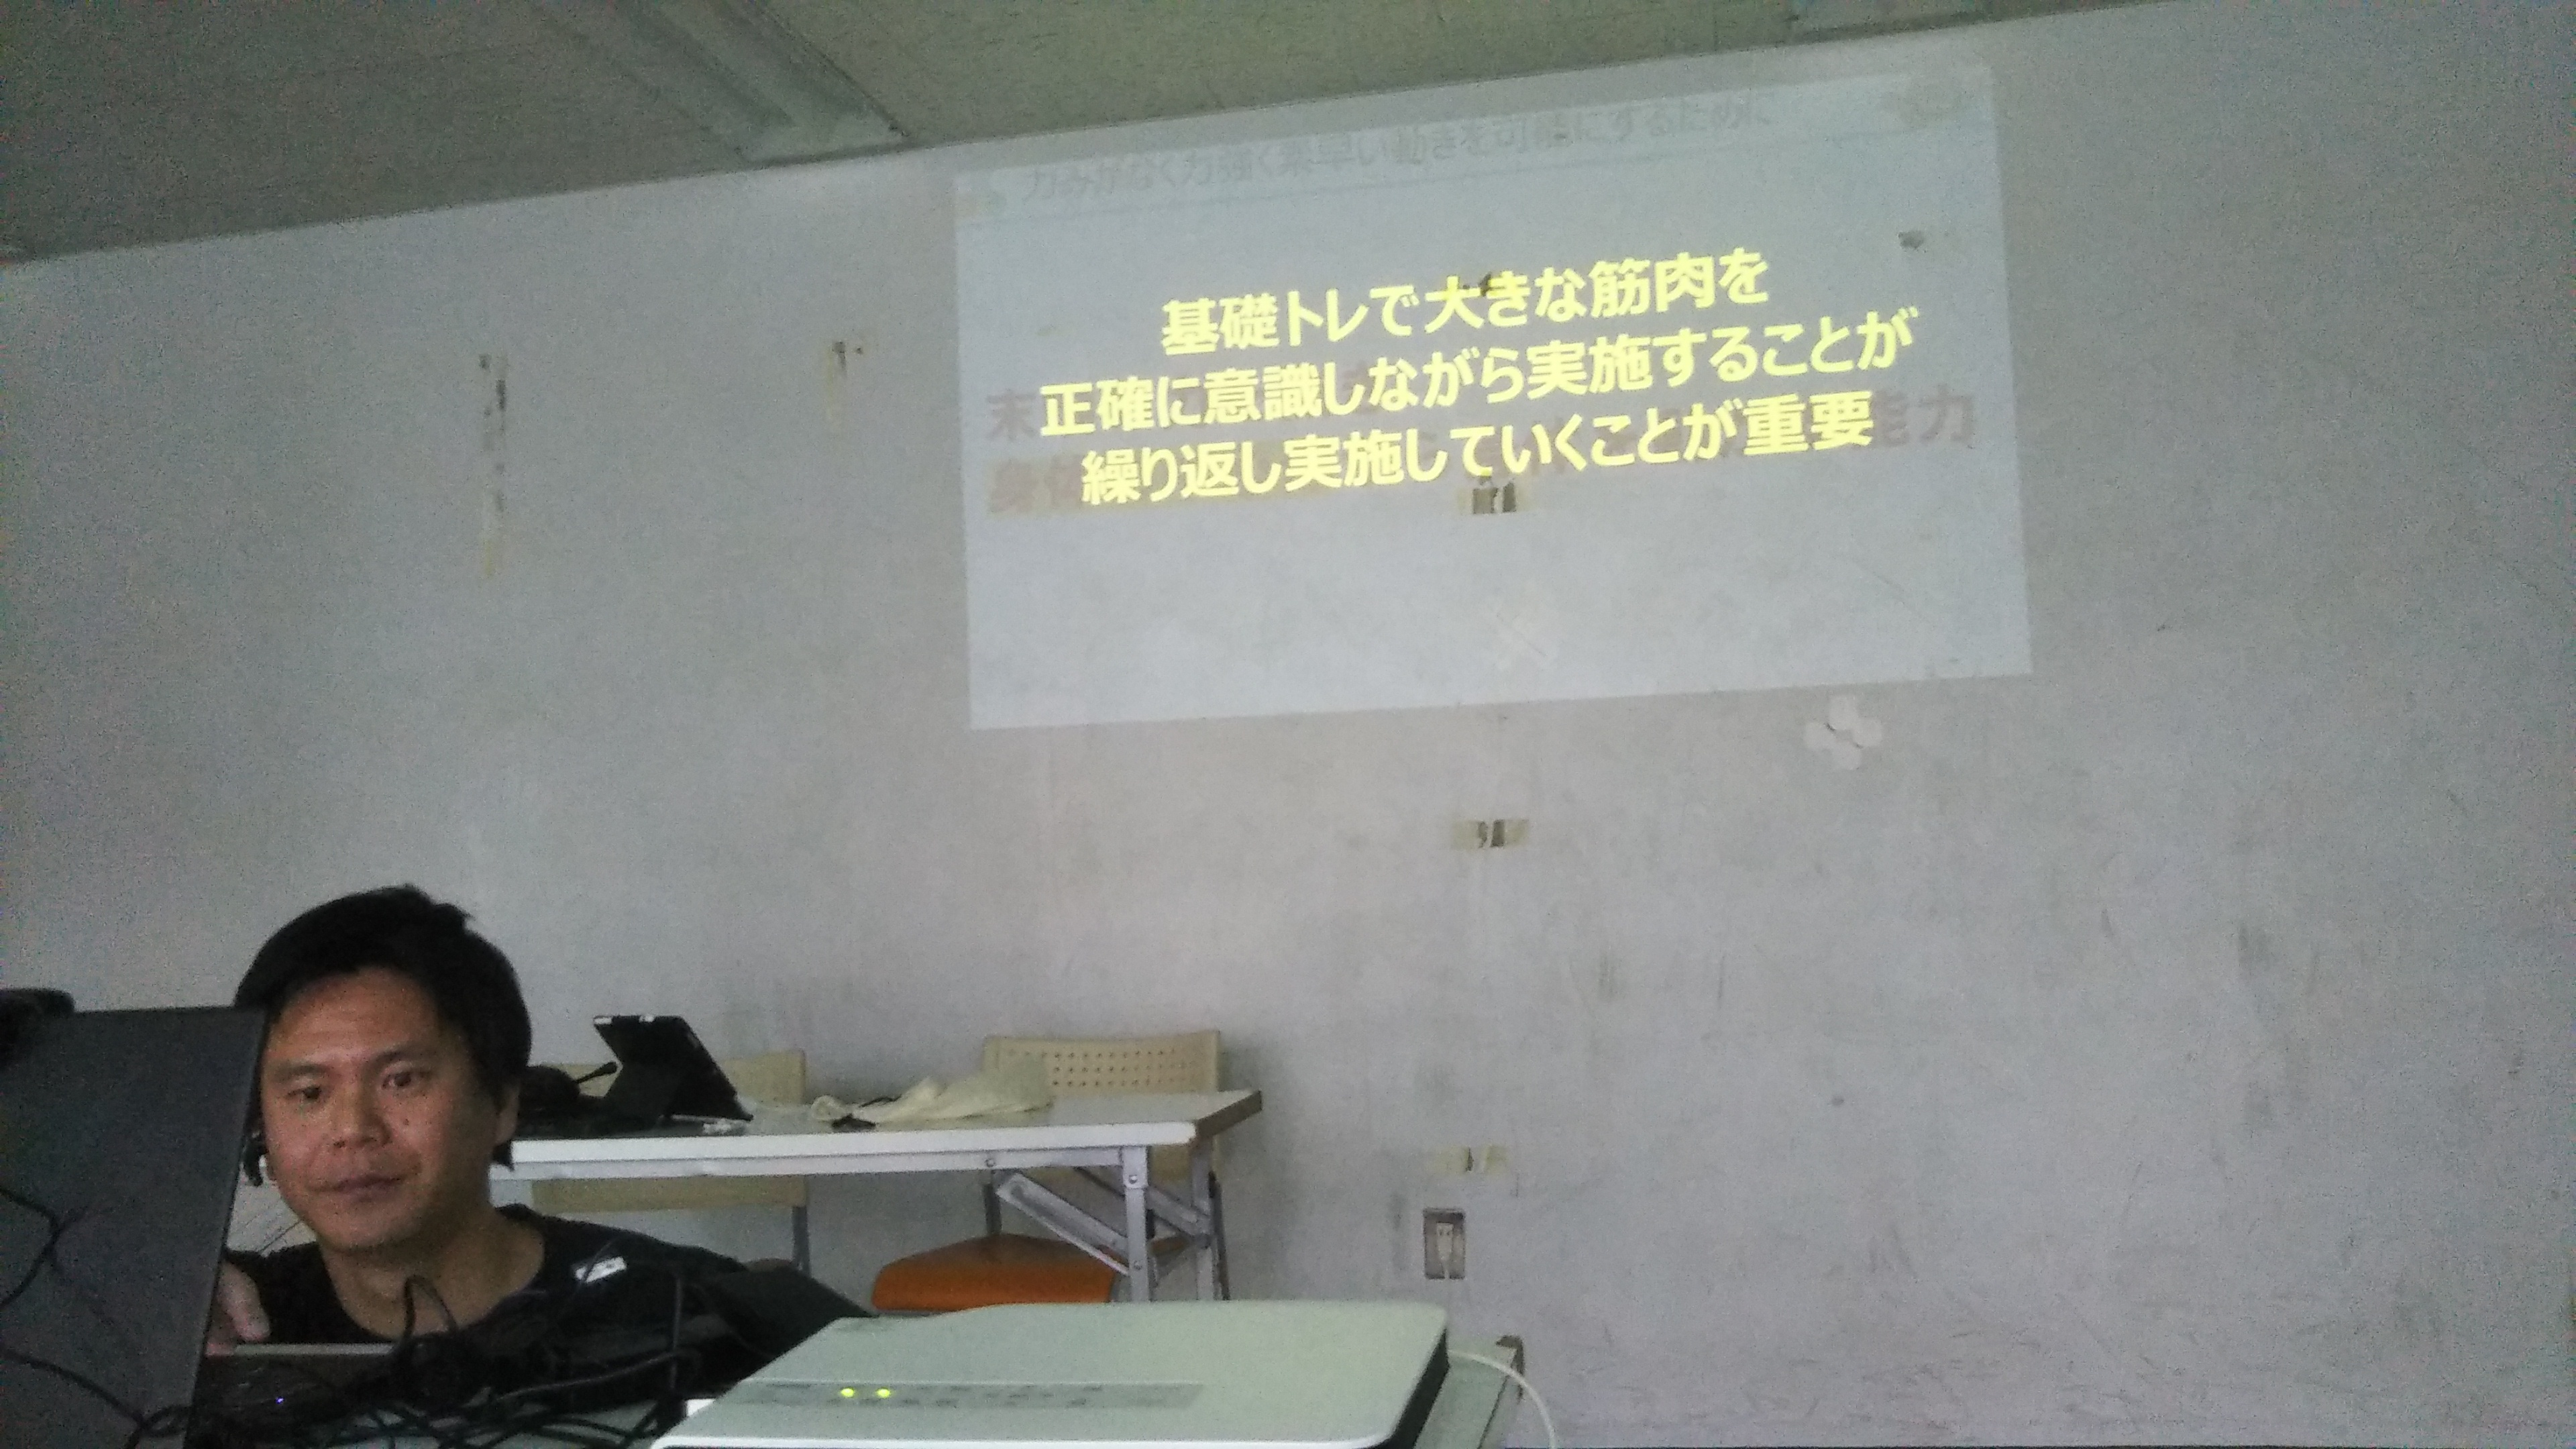 http://www.e-taishin.com/diary/img/20210322kenji8.jpg